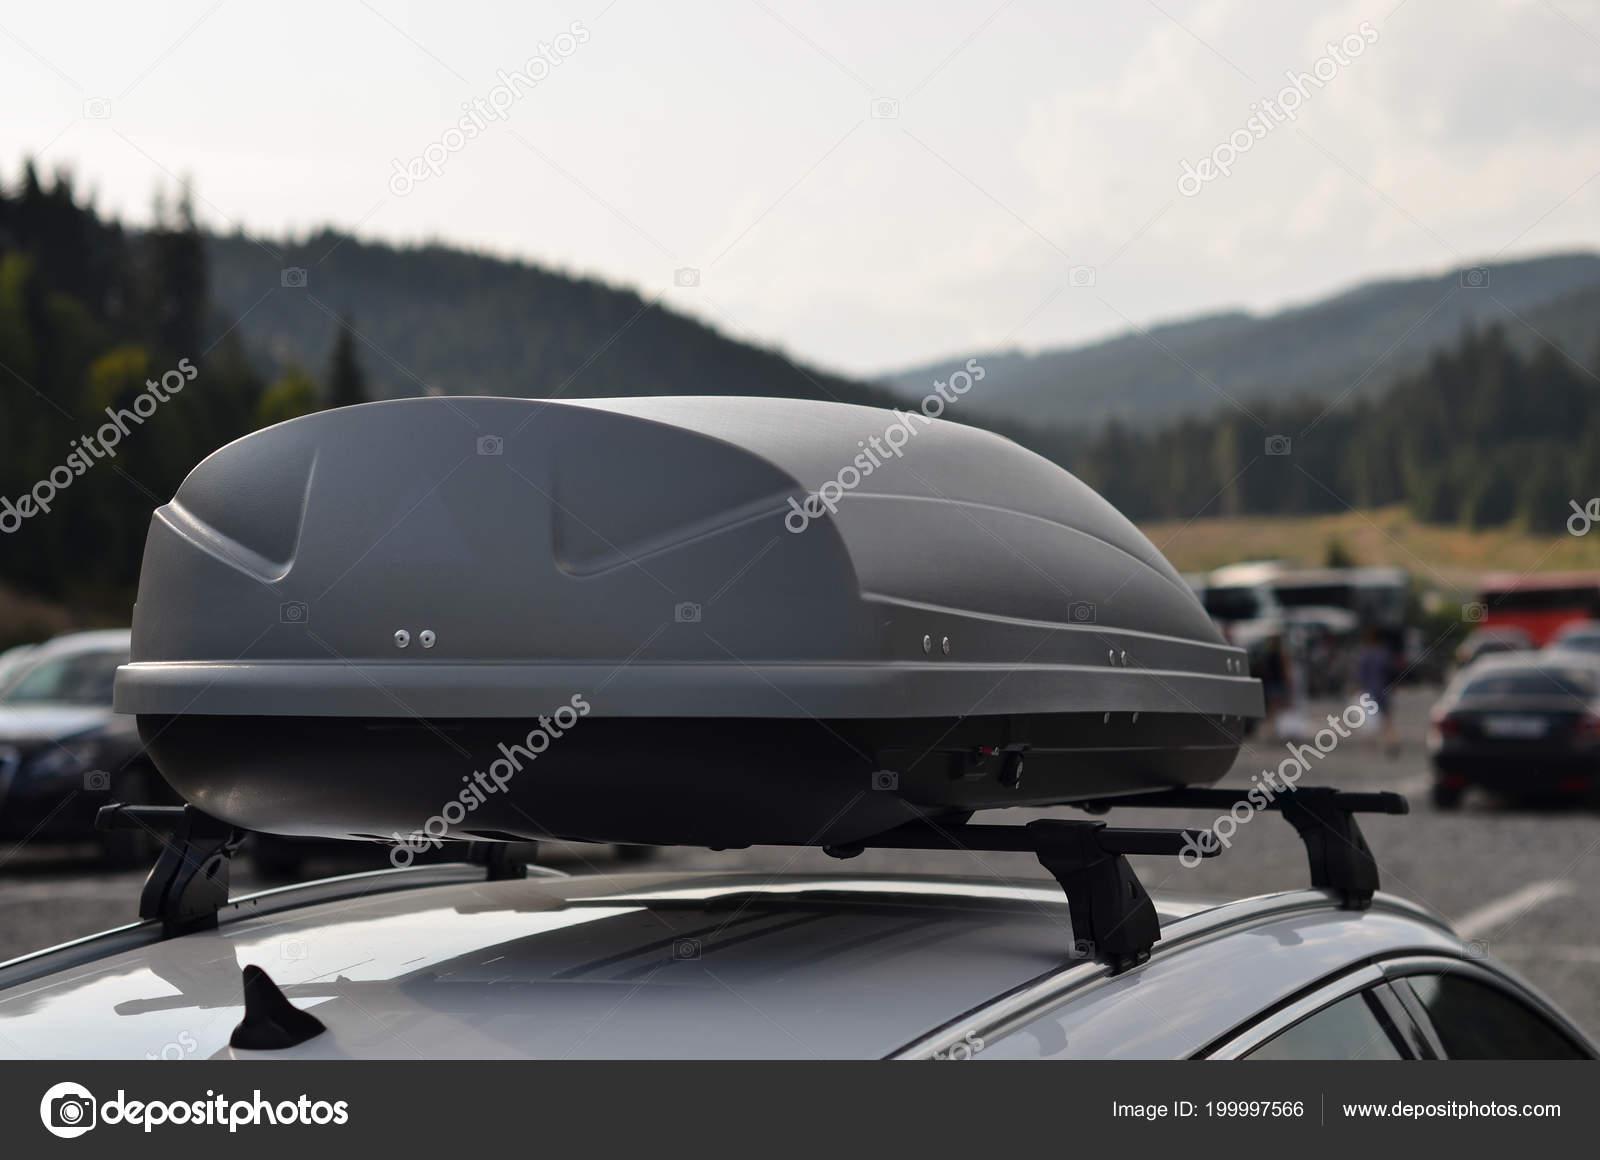 https depositphotos com 199997566 stock photo car roof rack cargo box html